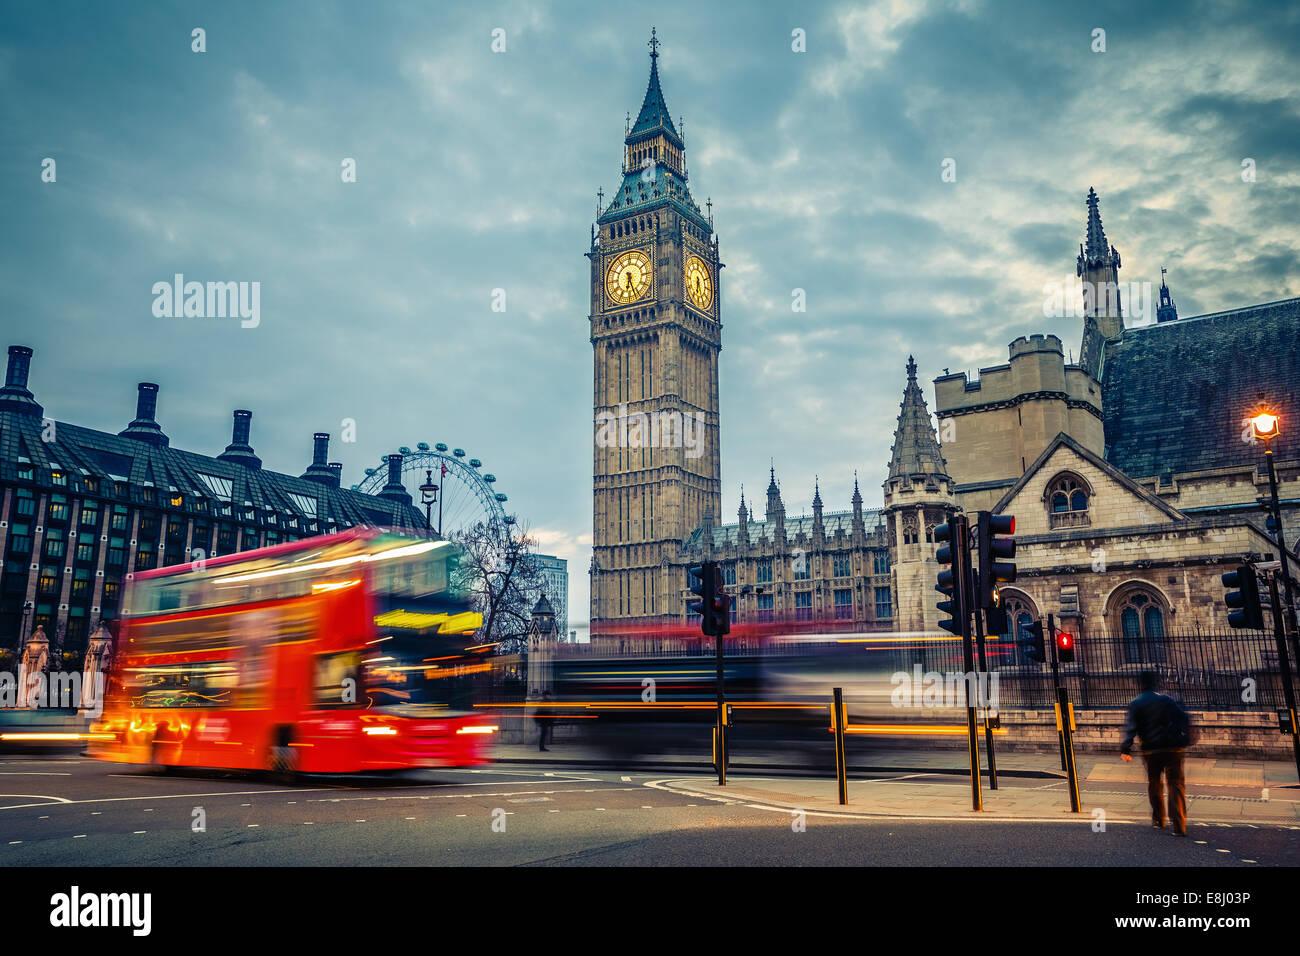 London at early morning - Stock Image